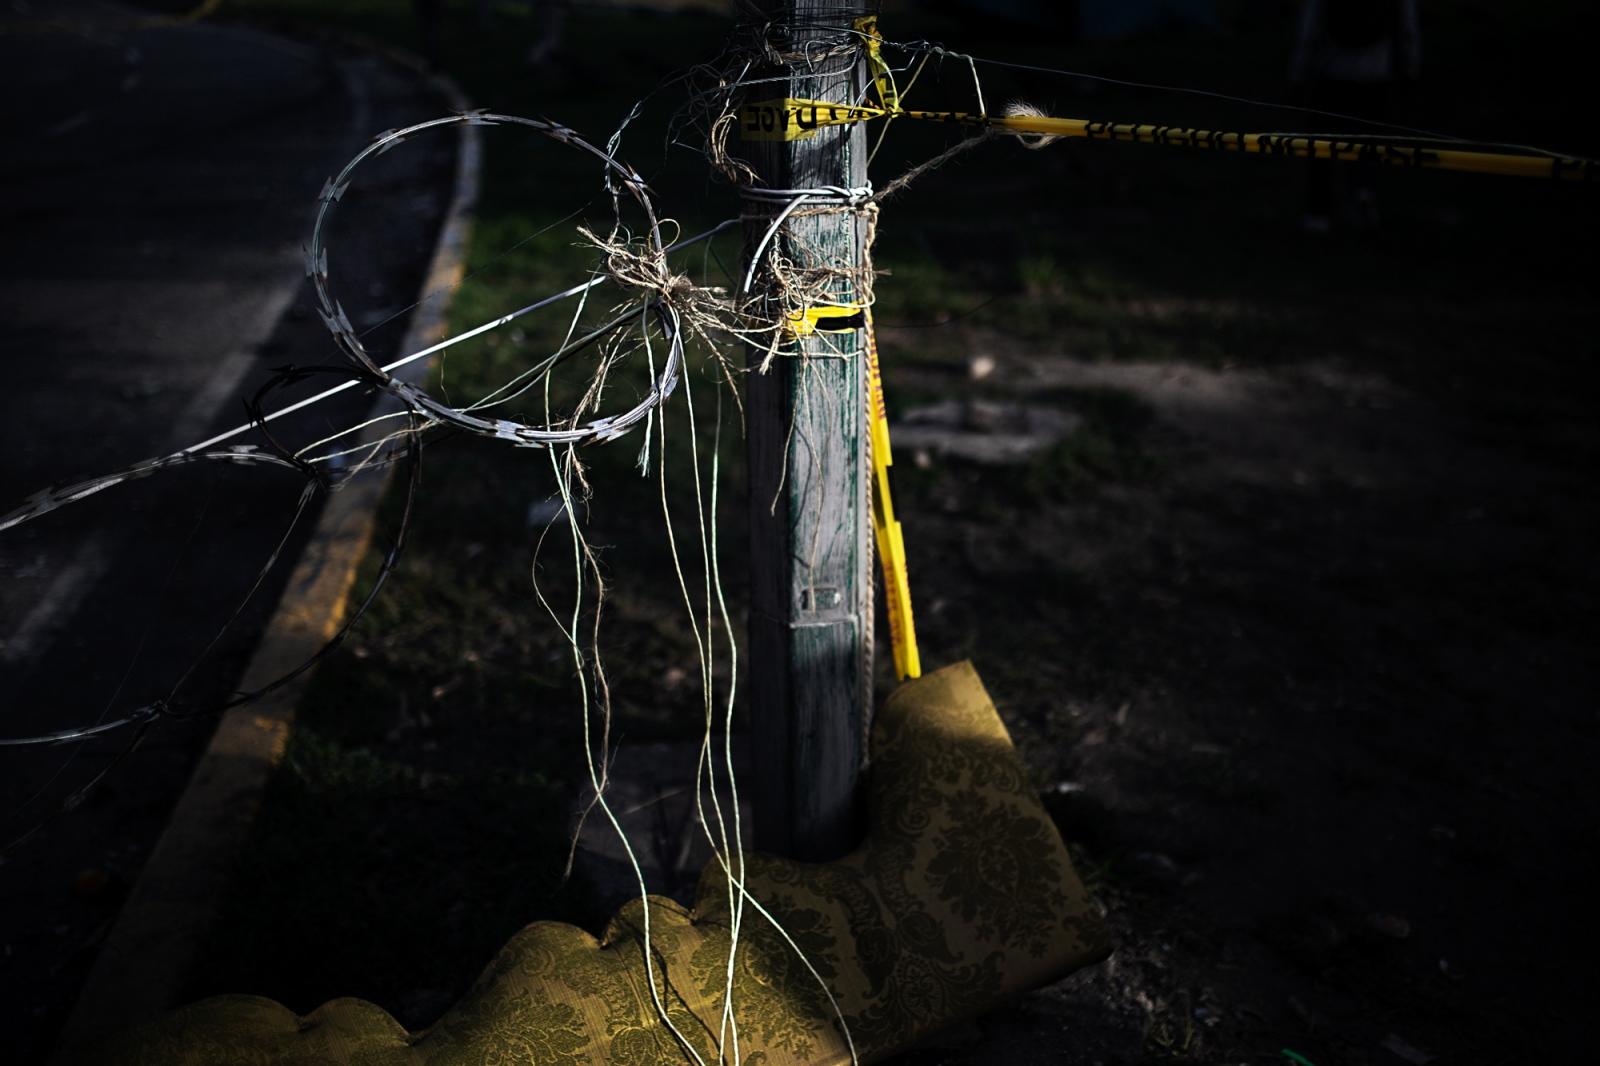 Art and Documentary Photography - Loading 006_VenezuelanUnrest_20170710_1407-Edit_Protestas.jpg